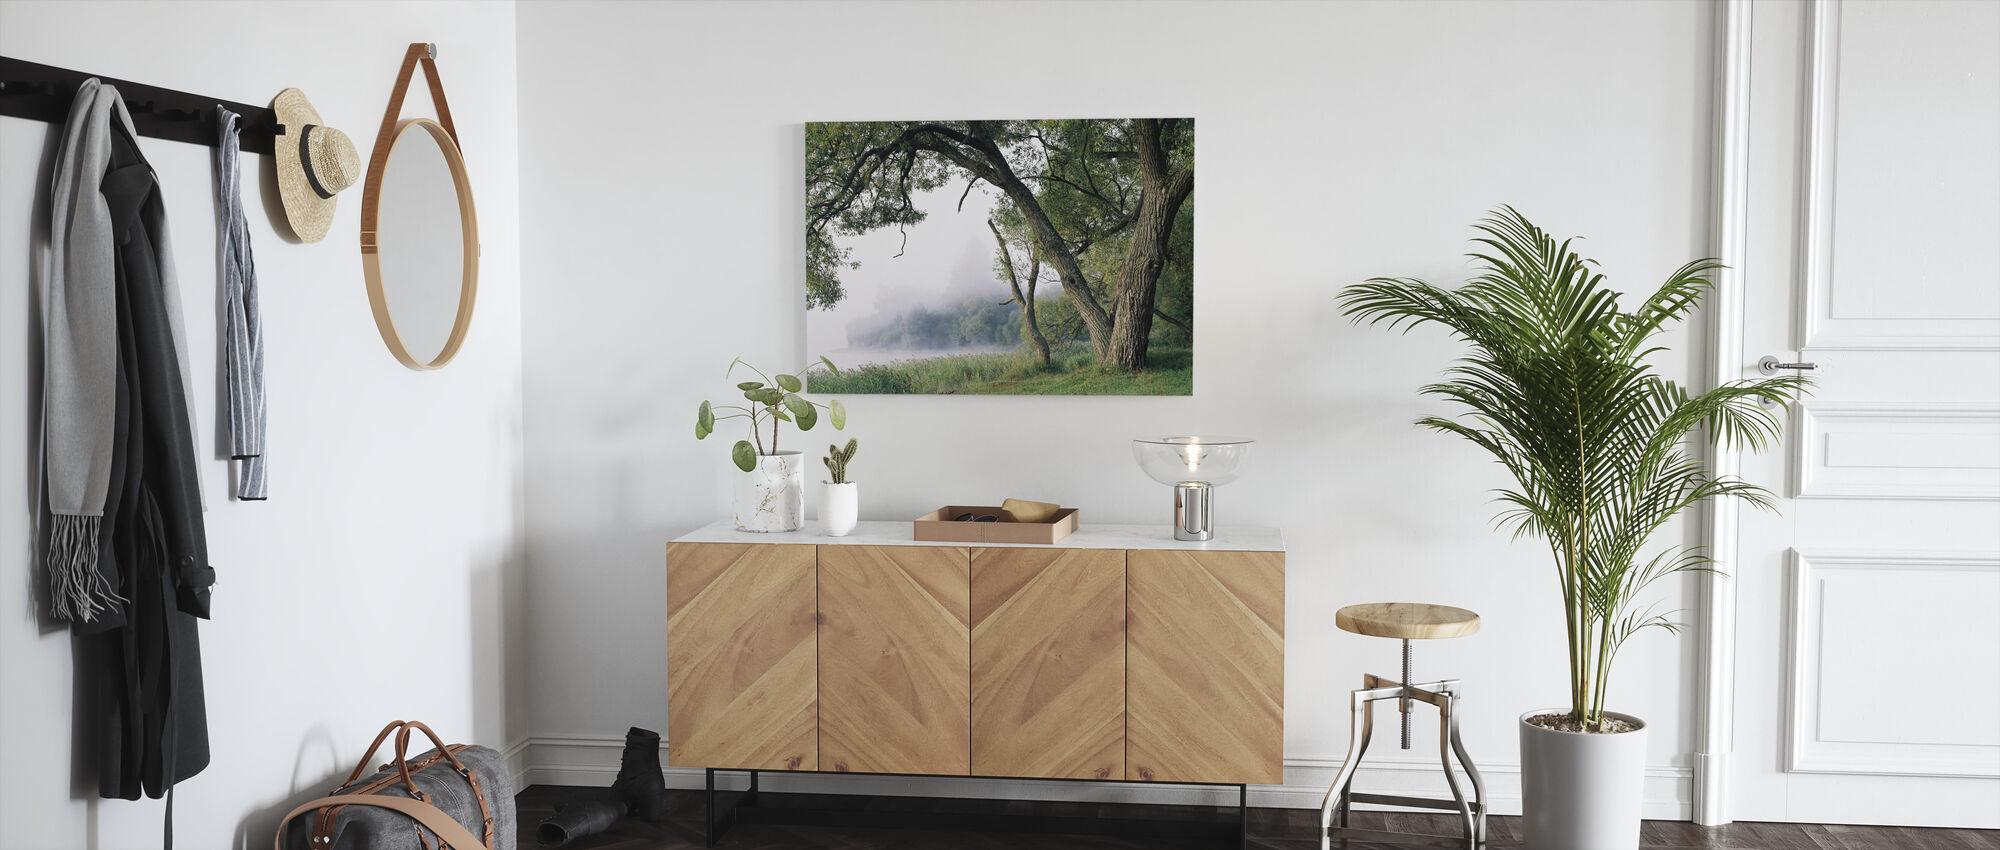 Puu sumussa - Canvastaulu - Aula